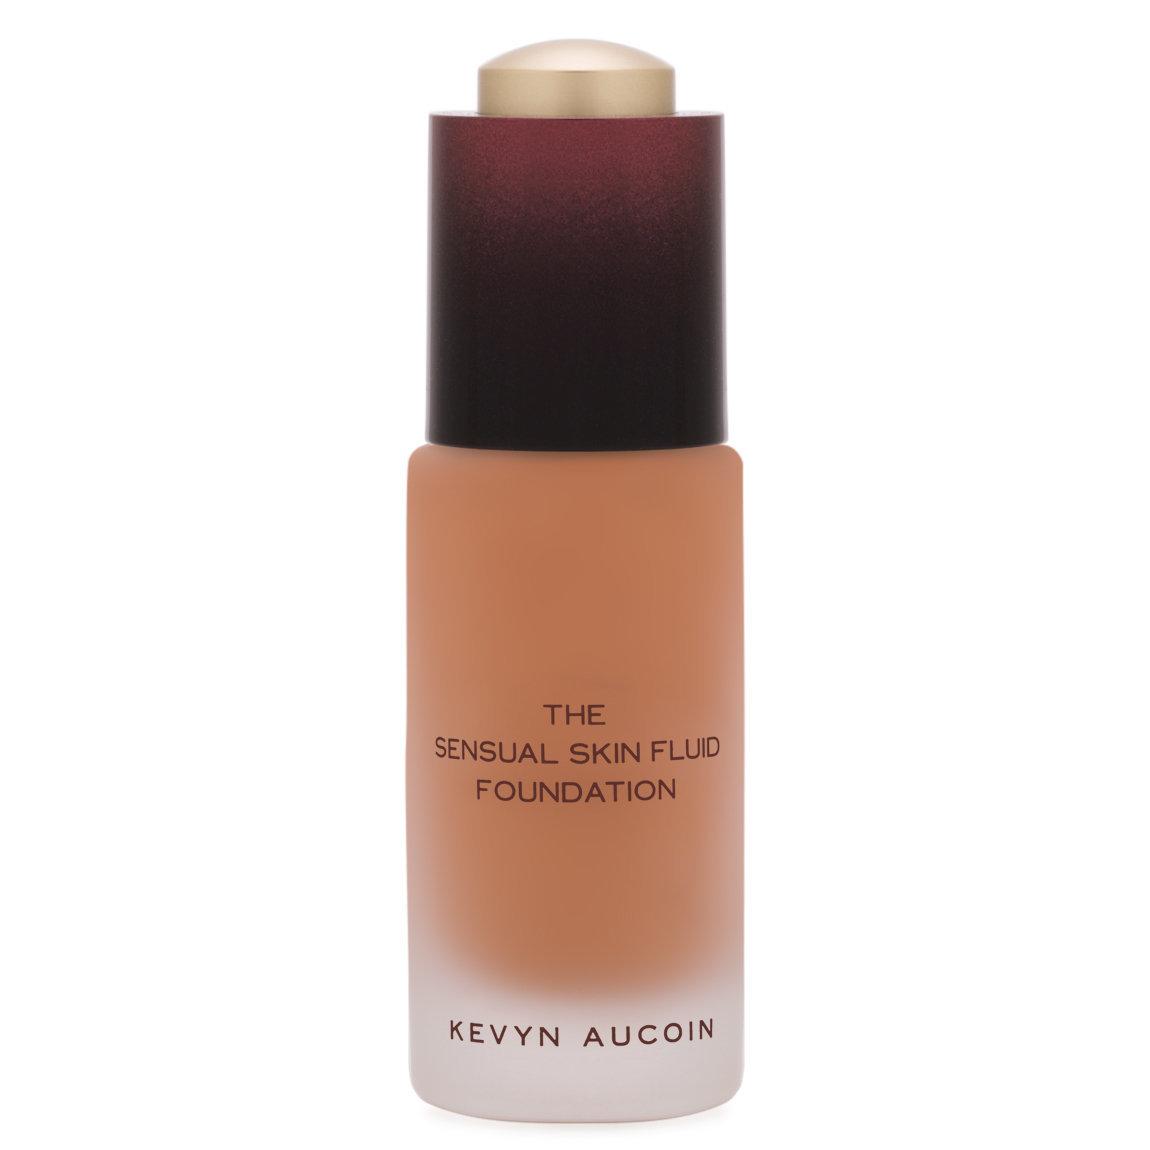 Kevyn Aucoin The Sensual Skin Fluid Foundation SF13 alternative view 1.